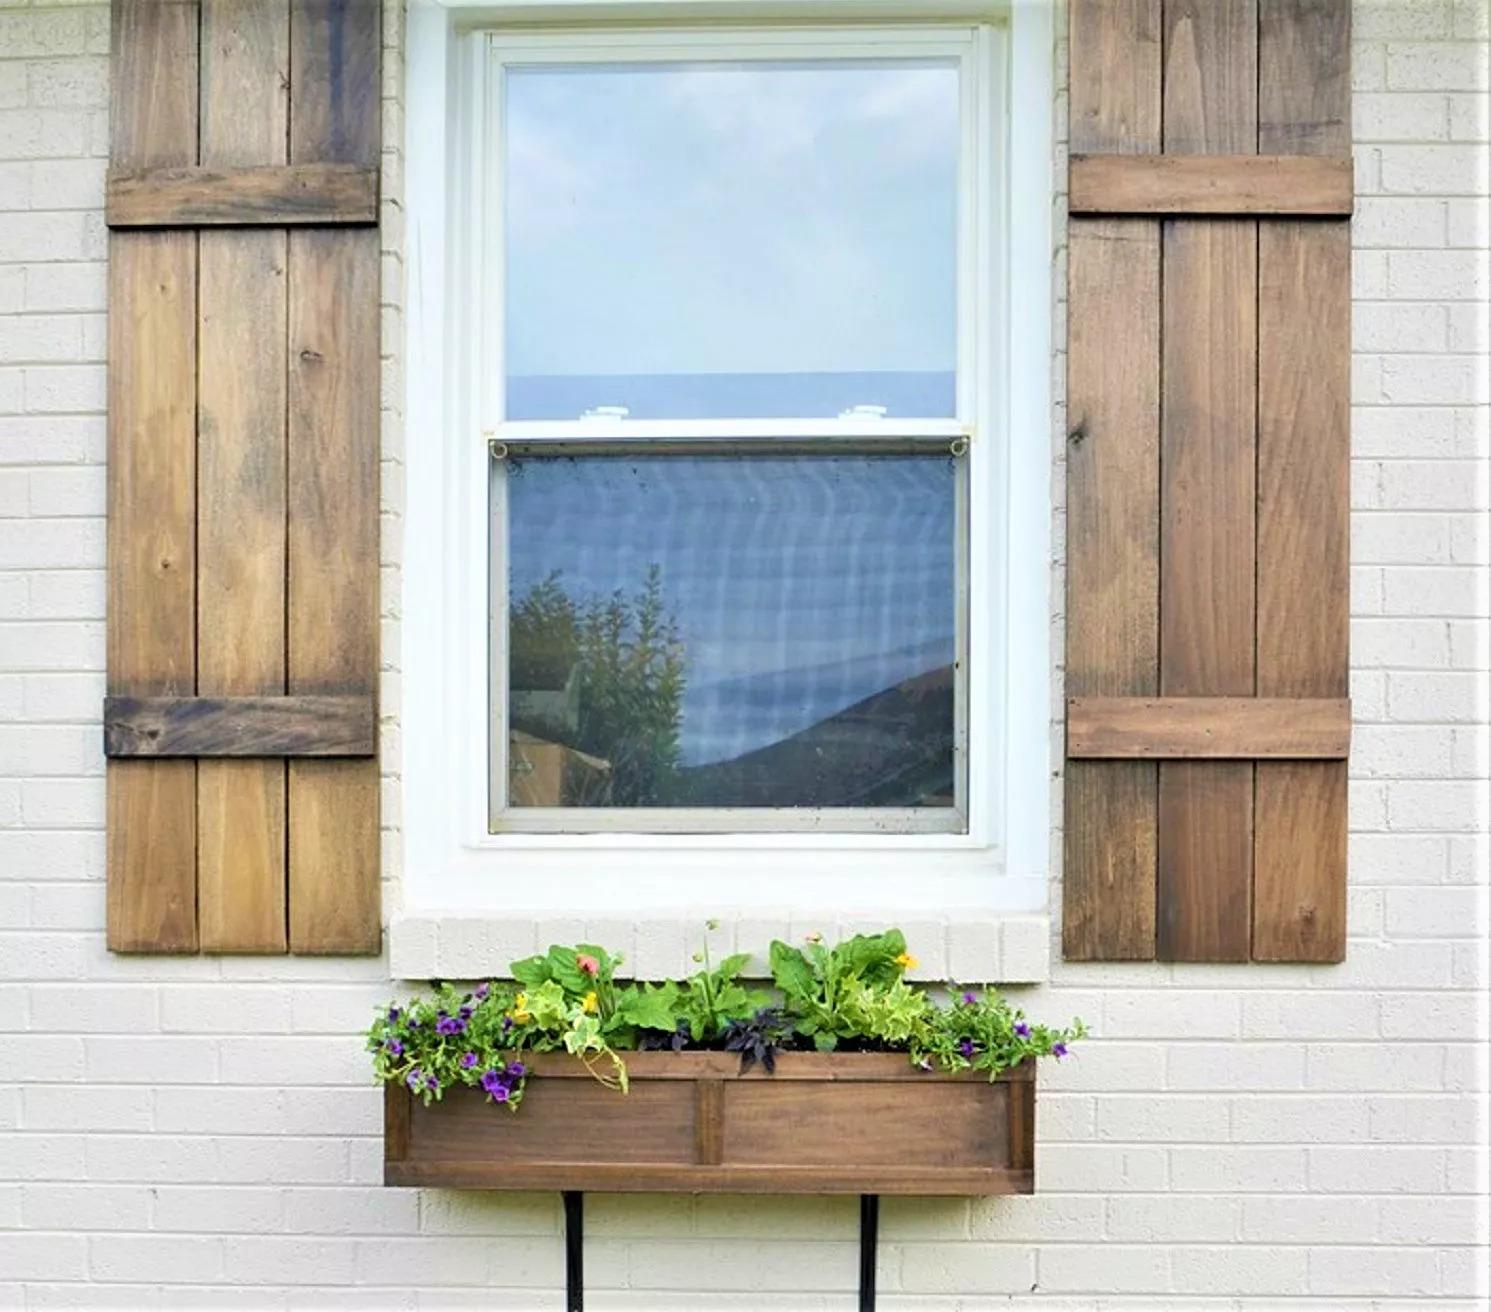 rustic-window-box